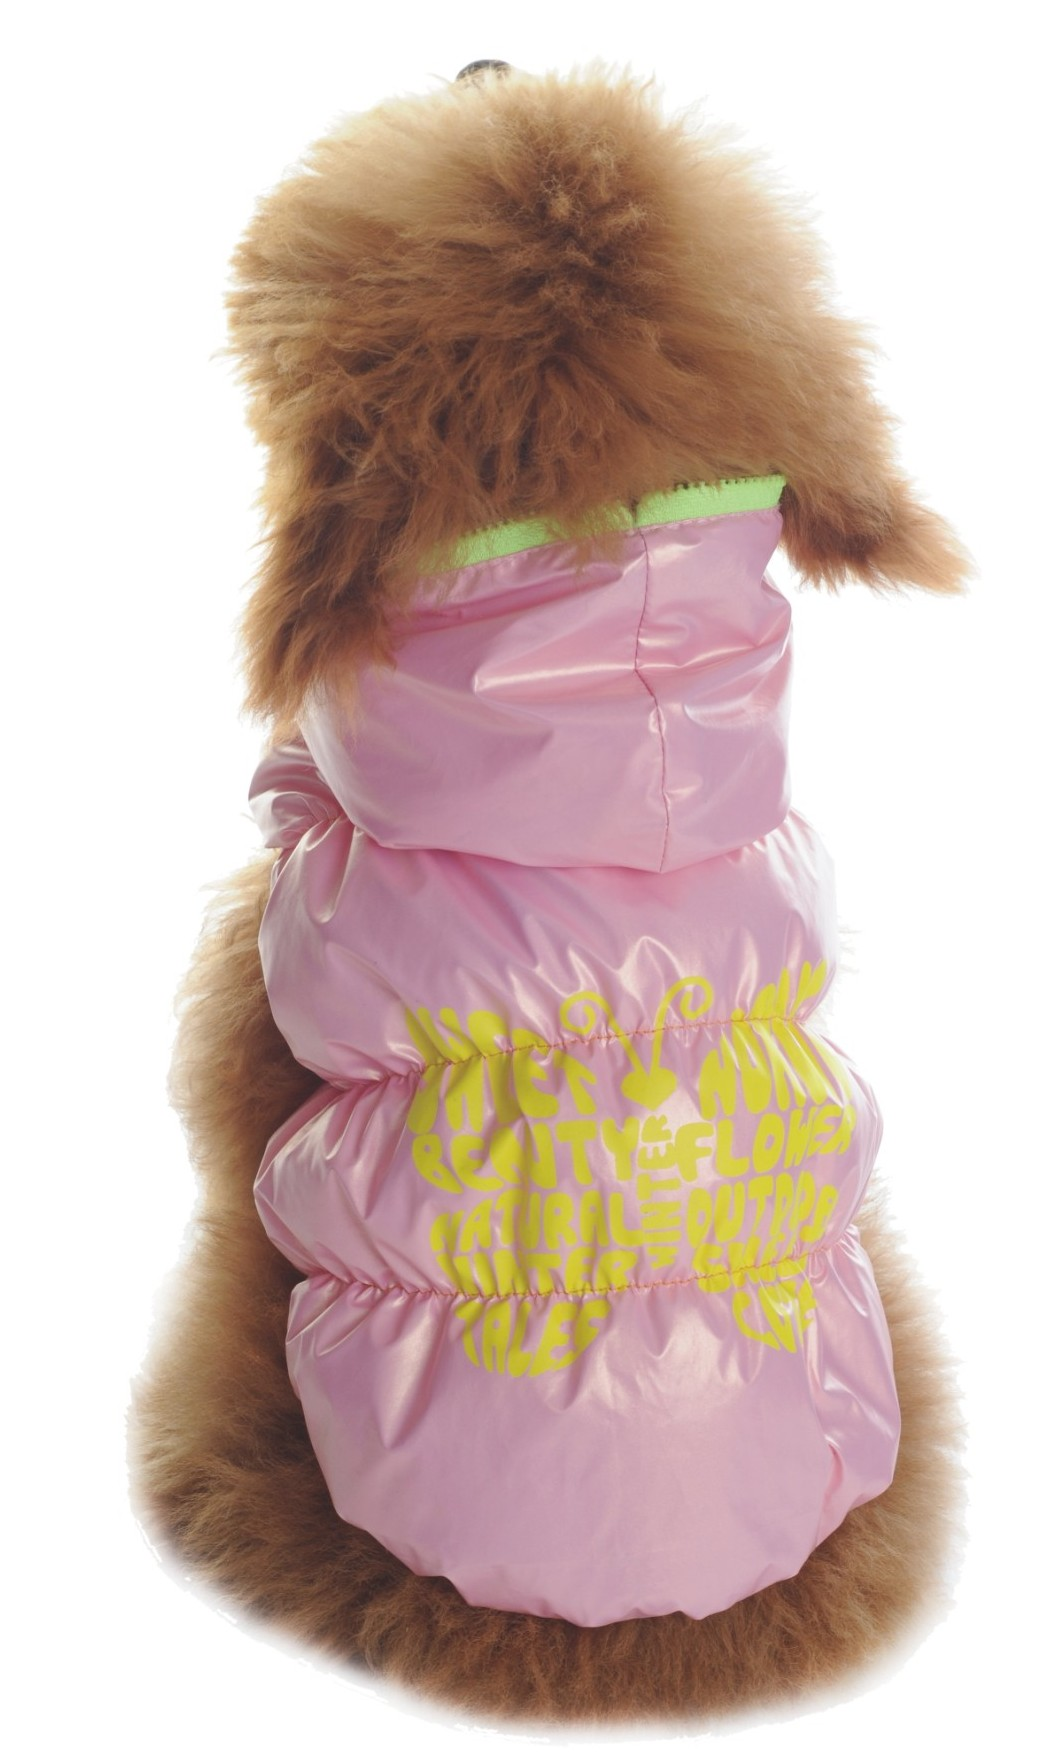 Куртка для собак Dobaz, утепленная, цвет: розовый перламутр. ДА1127АЛ/п. Размер L куртка для собак дог мастер утепленная спорт xl